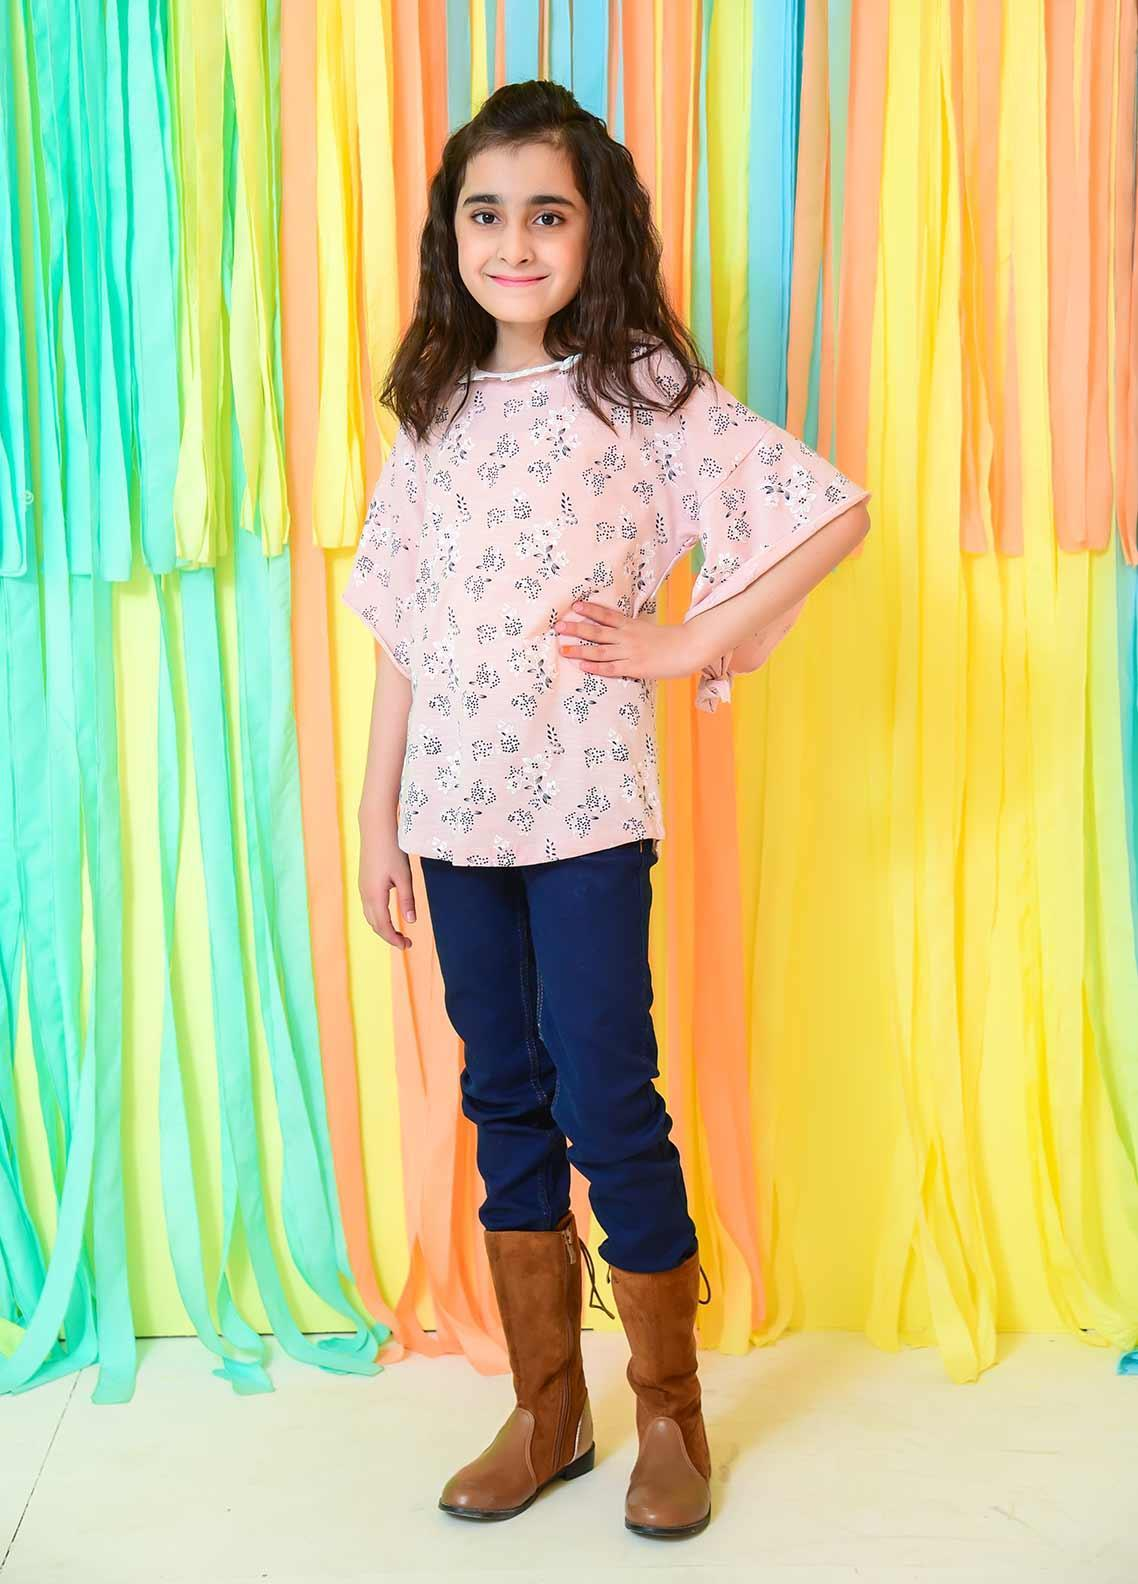 Ochre Cotton Fancy Western Tops for Girls -  OGK 59 Rose Pink